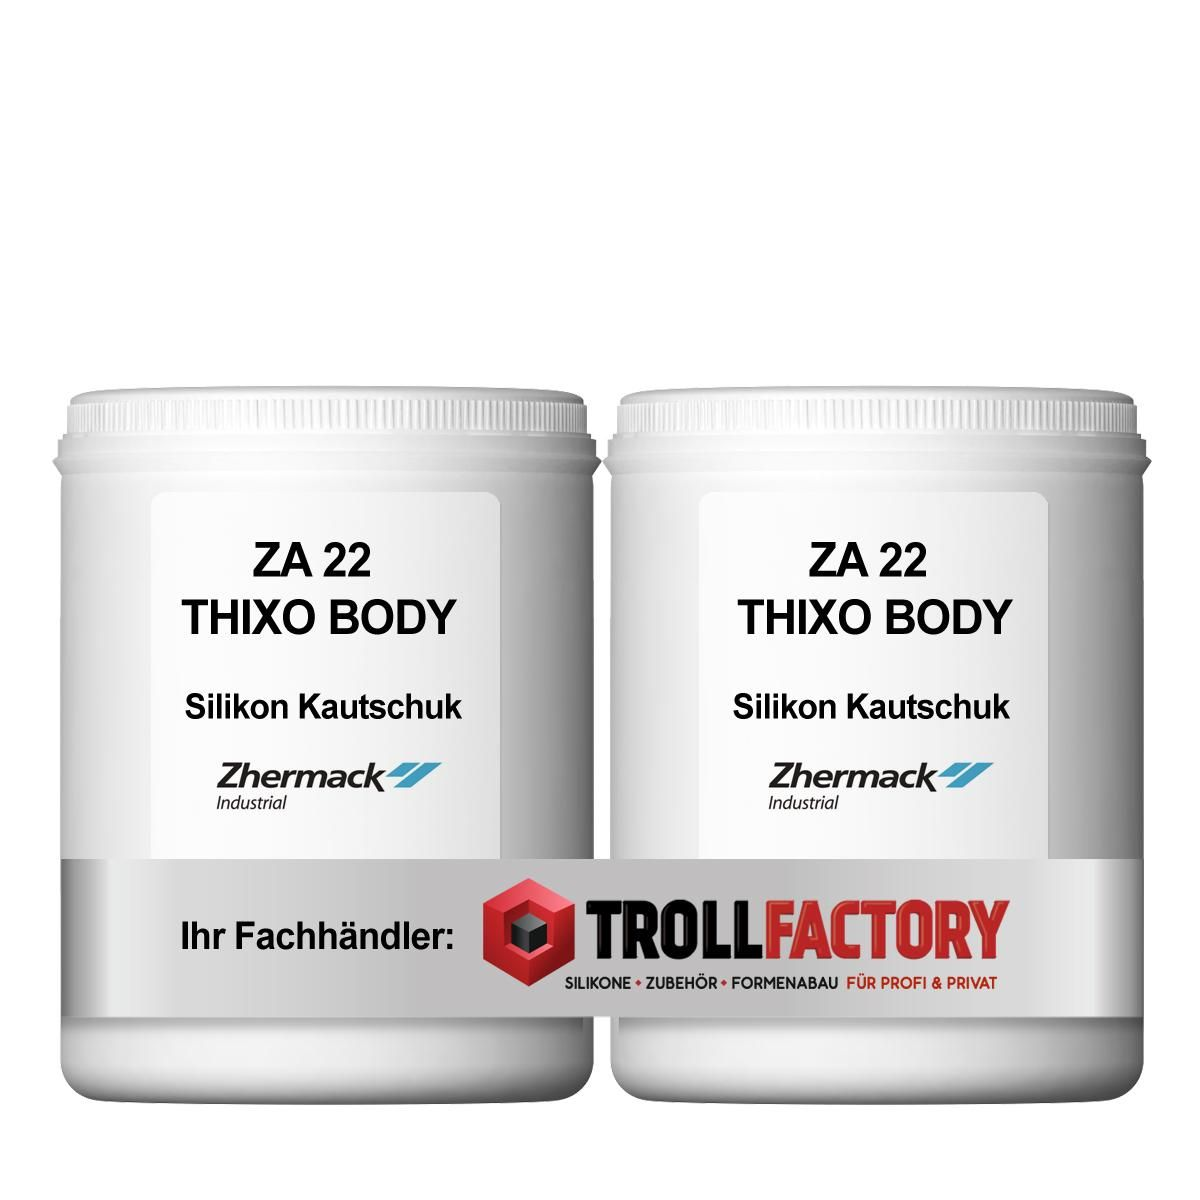 Zhermack Silikon Kautschuk ZA 22 THIXO BODY Thixotropic Haut streichfähig 2kg